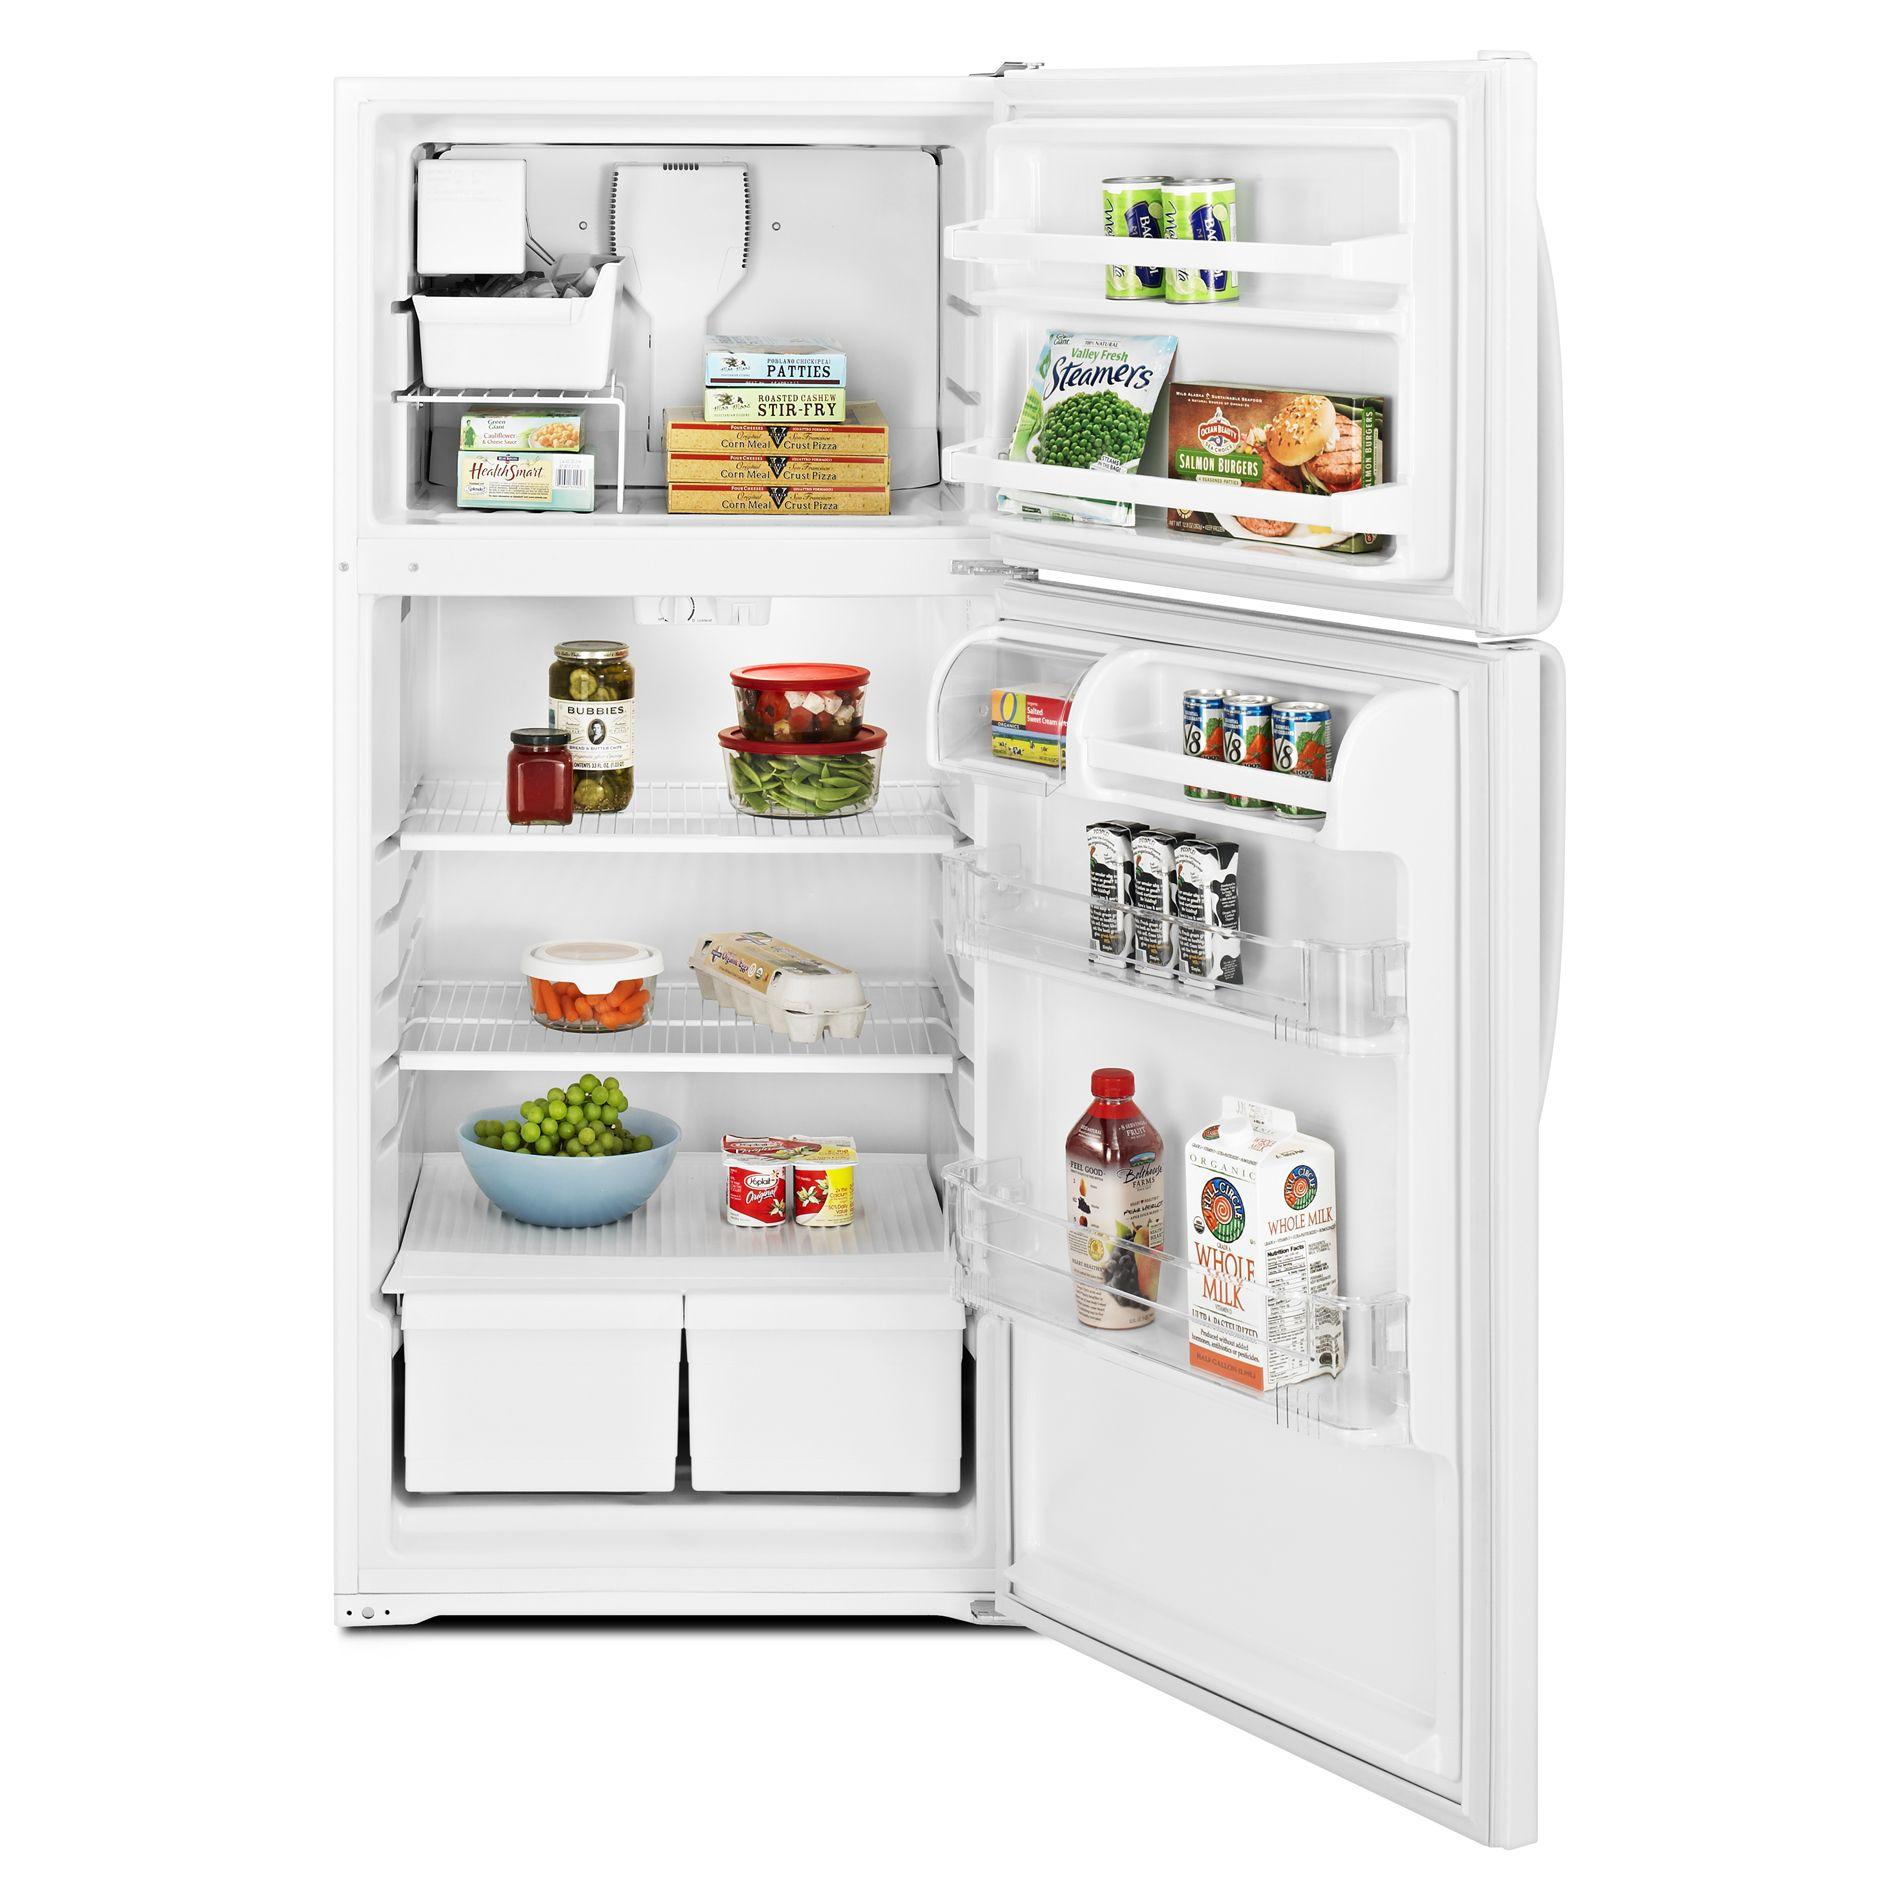 Kenmore 14.4 cu. ft. Top-Freezer Refrigerator